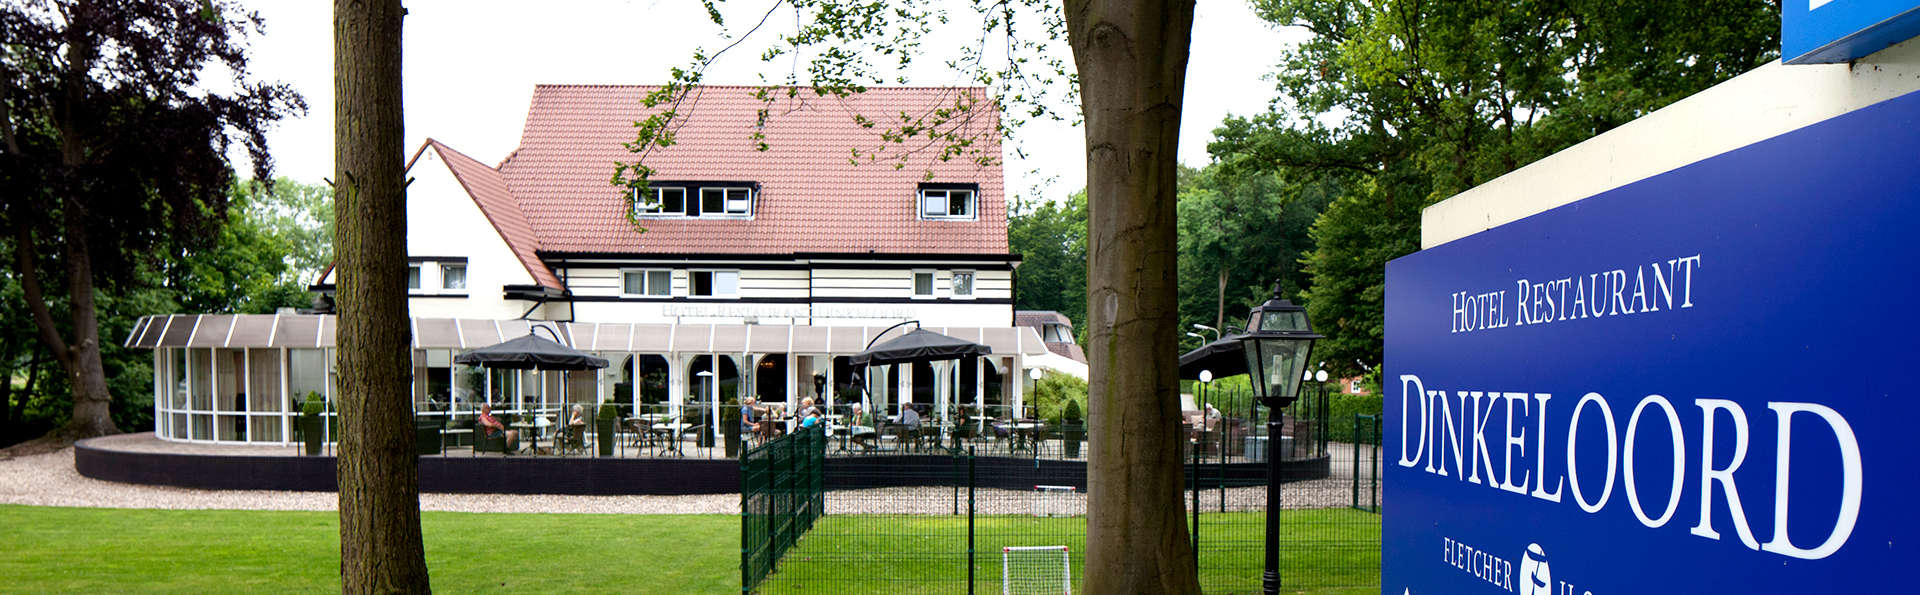 Fletcher Hotel-Restaurant Dinkeloord - Edit_Front3.jpg